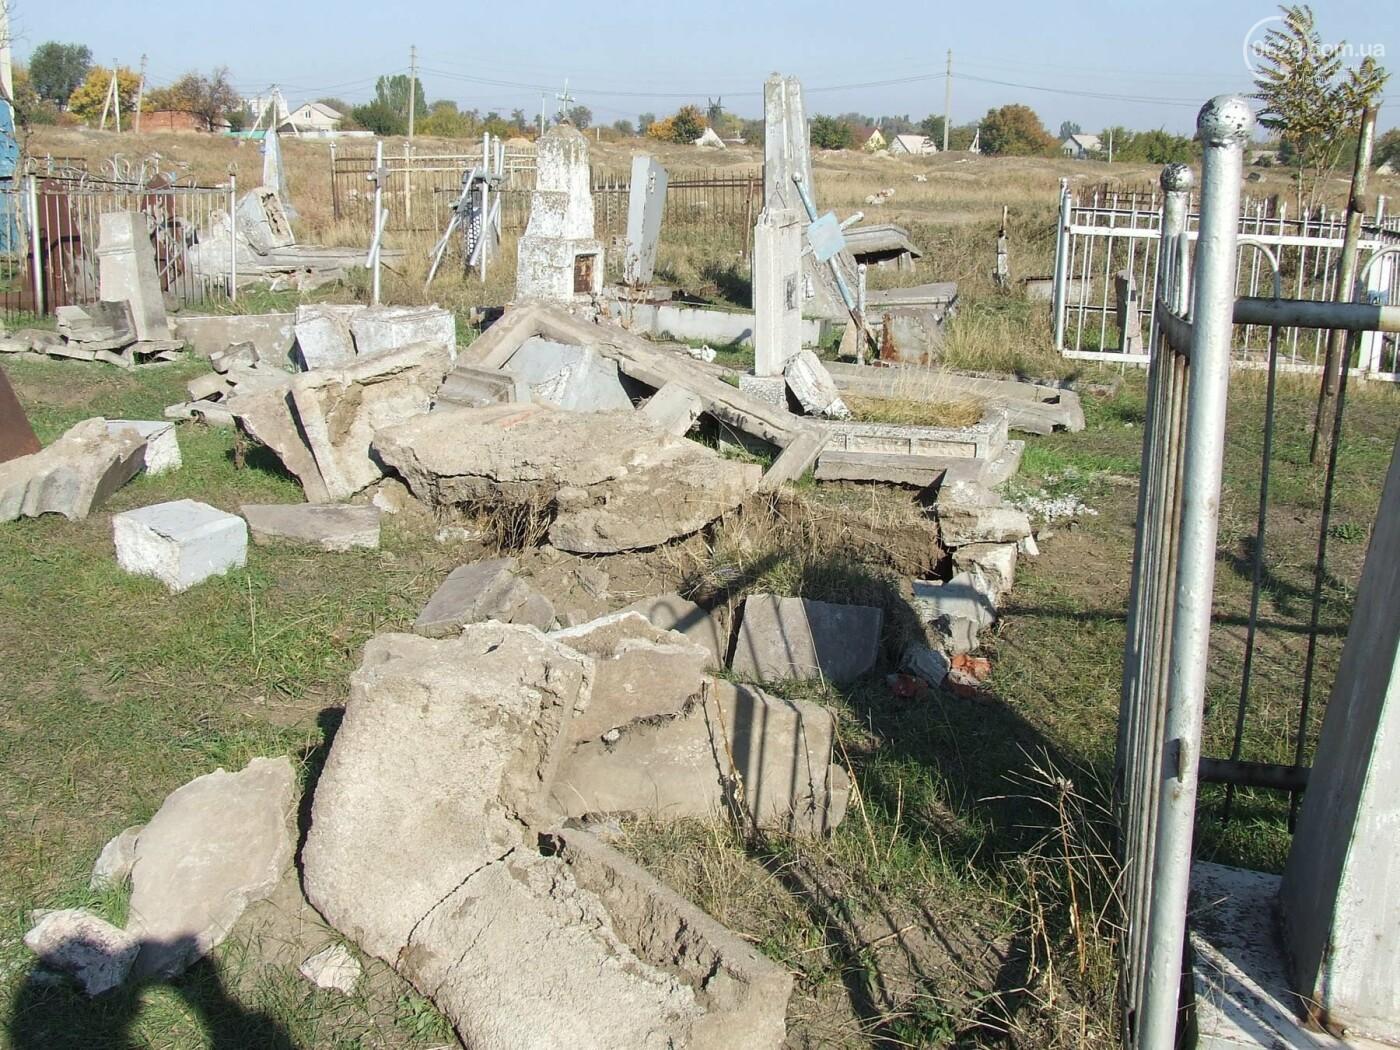 Вандалы разгромили могилы на самом старом кладбище Мариуполя, - ФОТО, фото-3